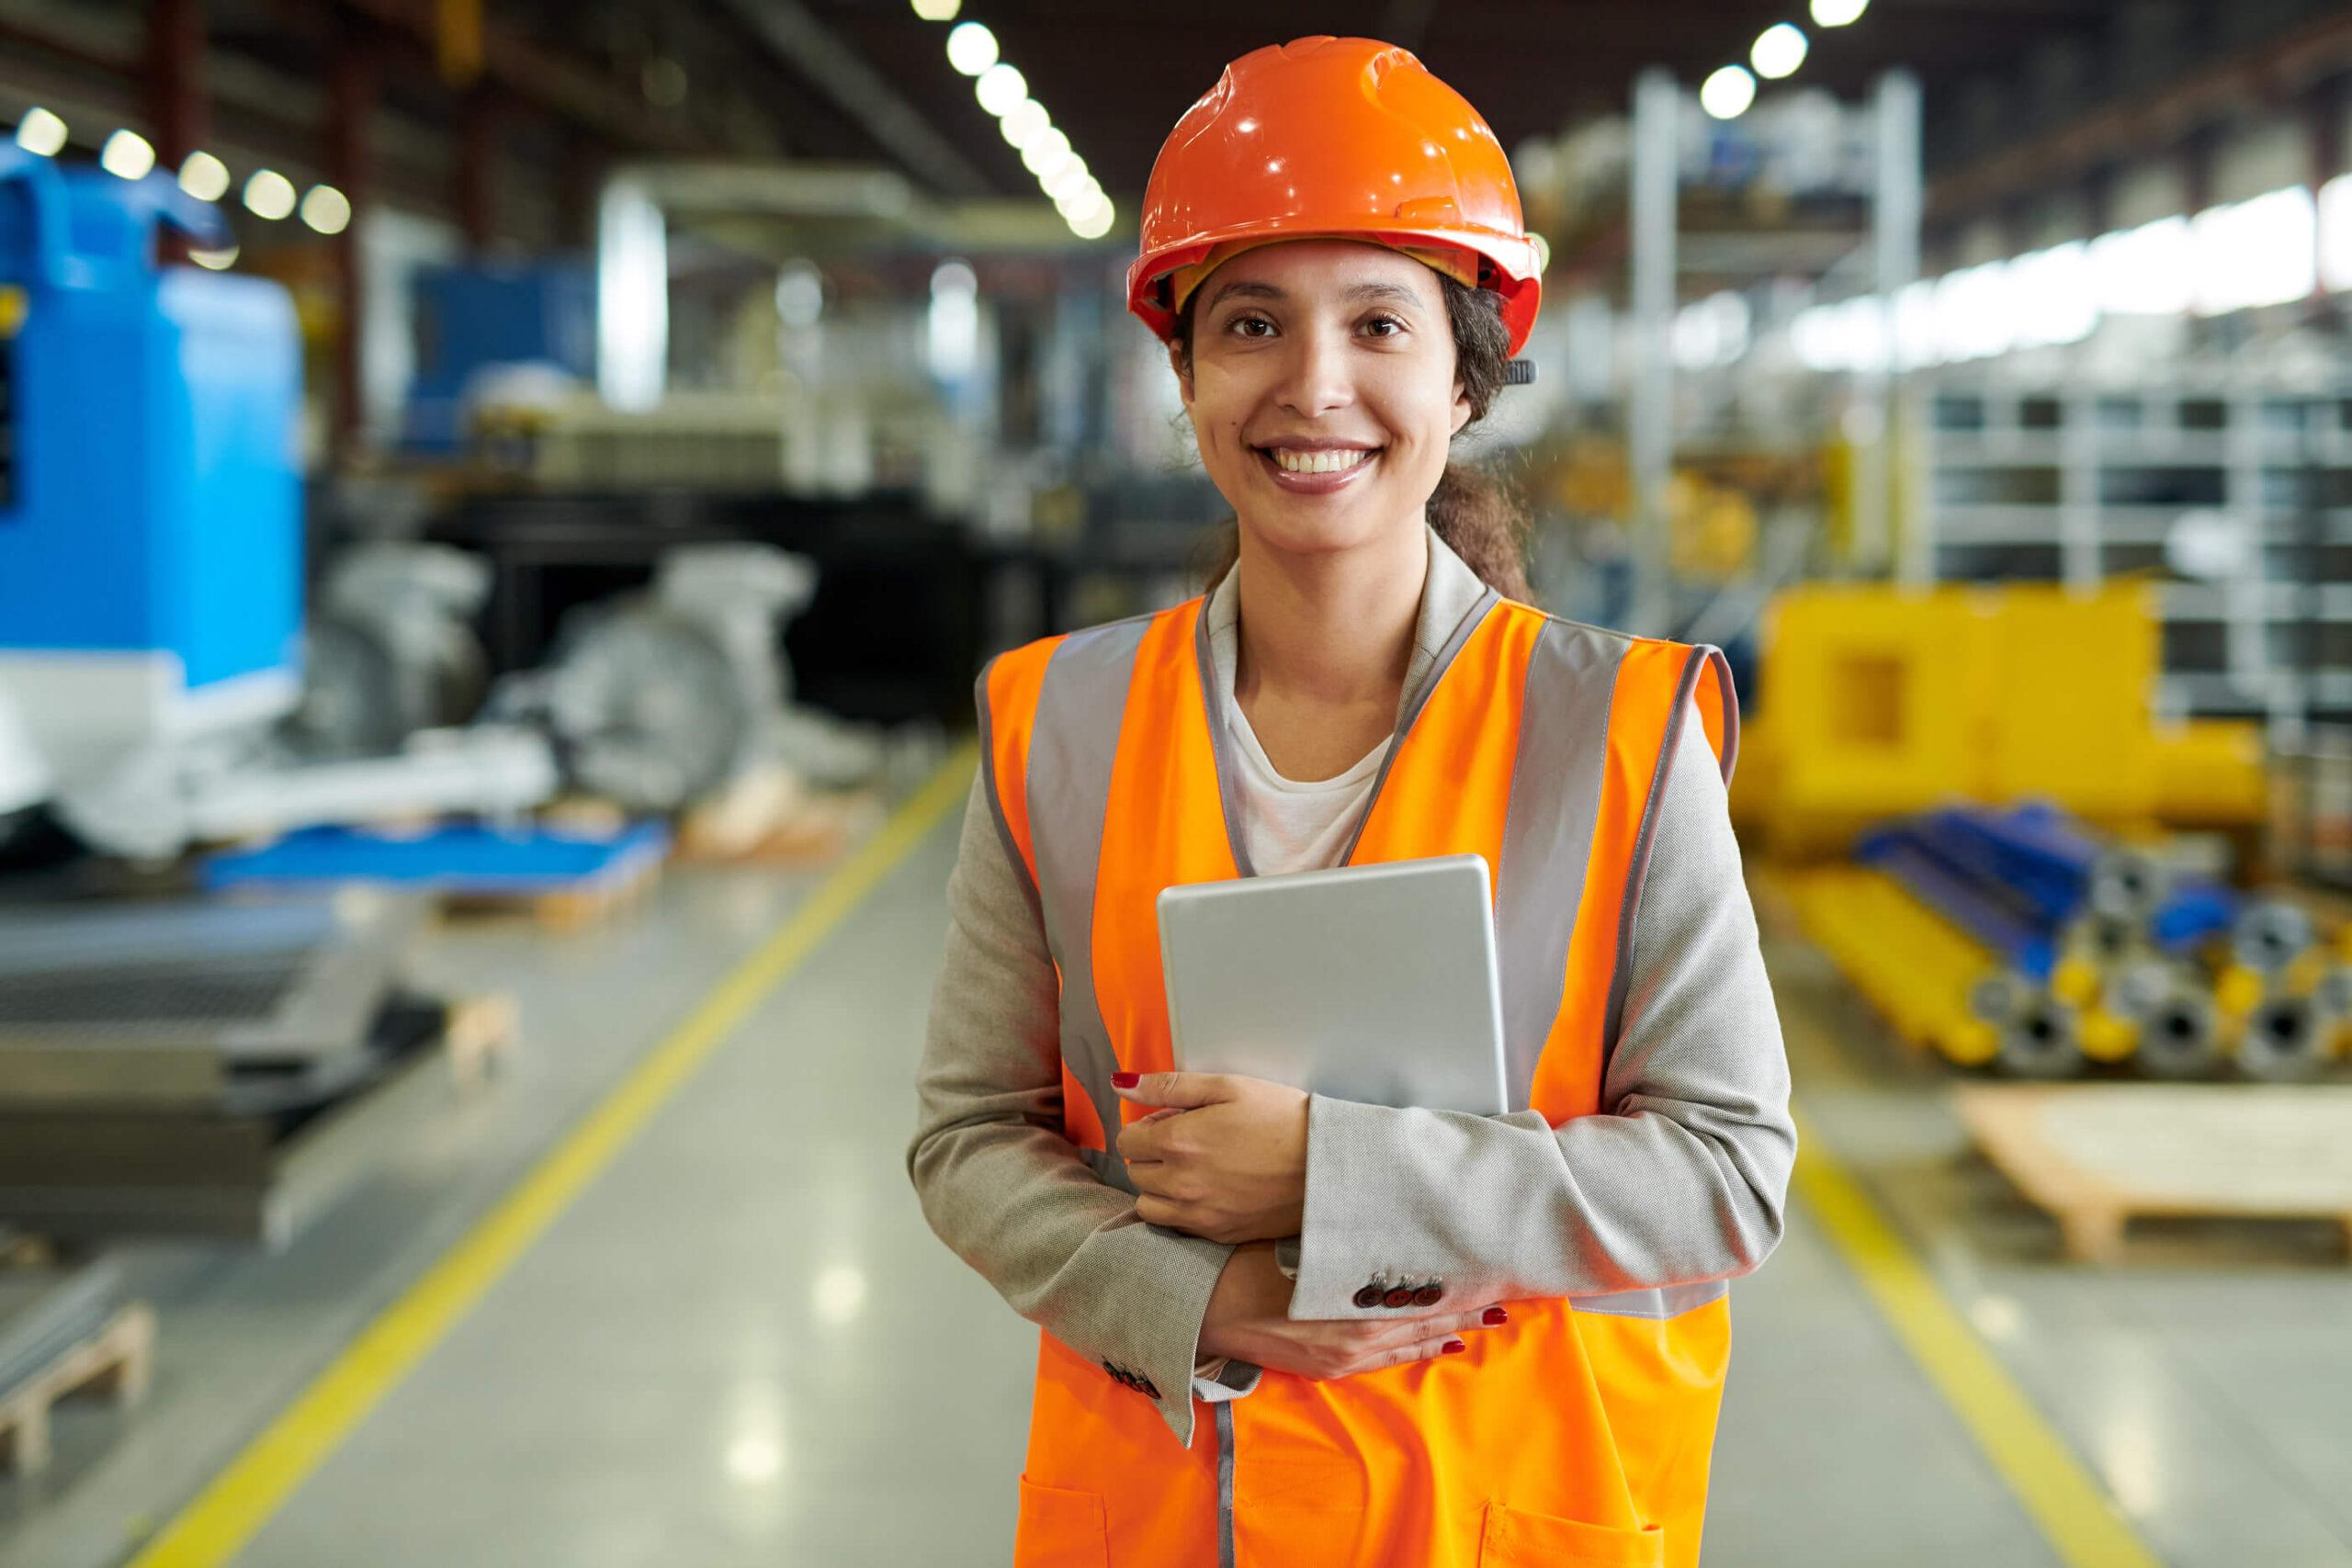 Covid Employement Australia